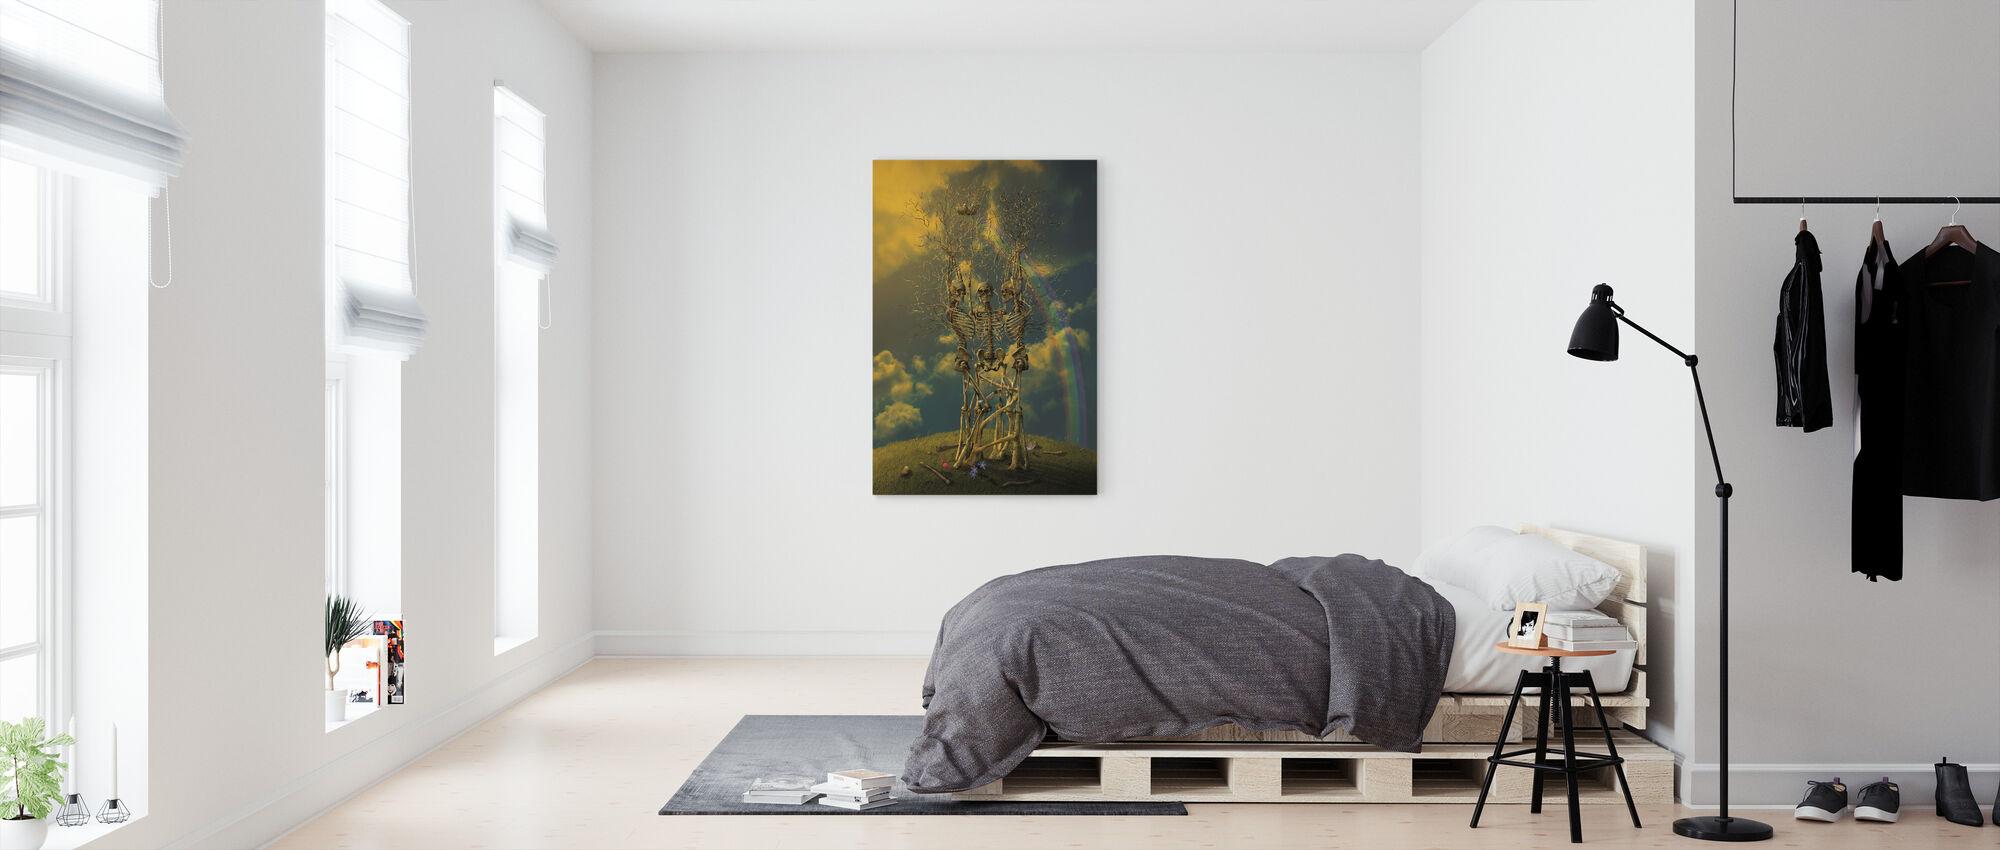 LifeCycle - Canvas print - Bedroom